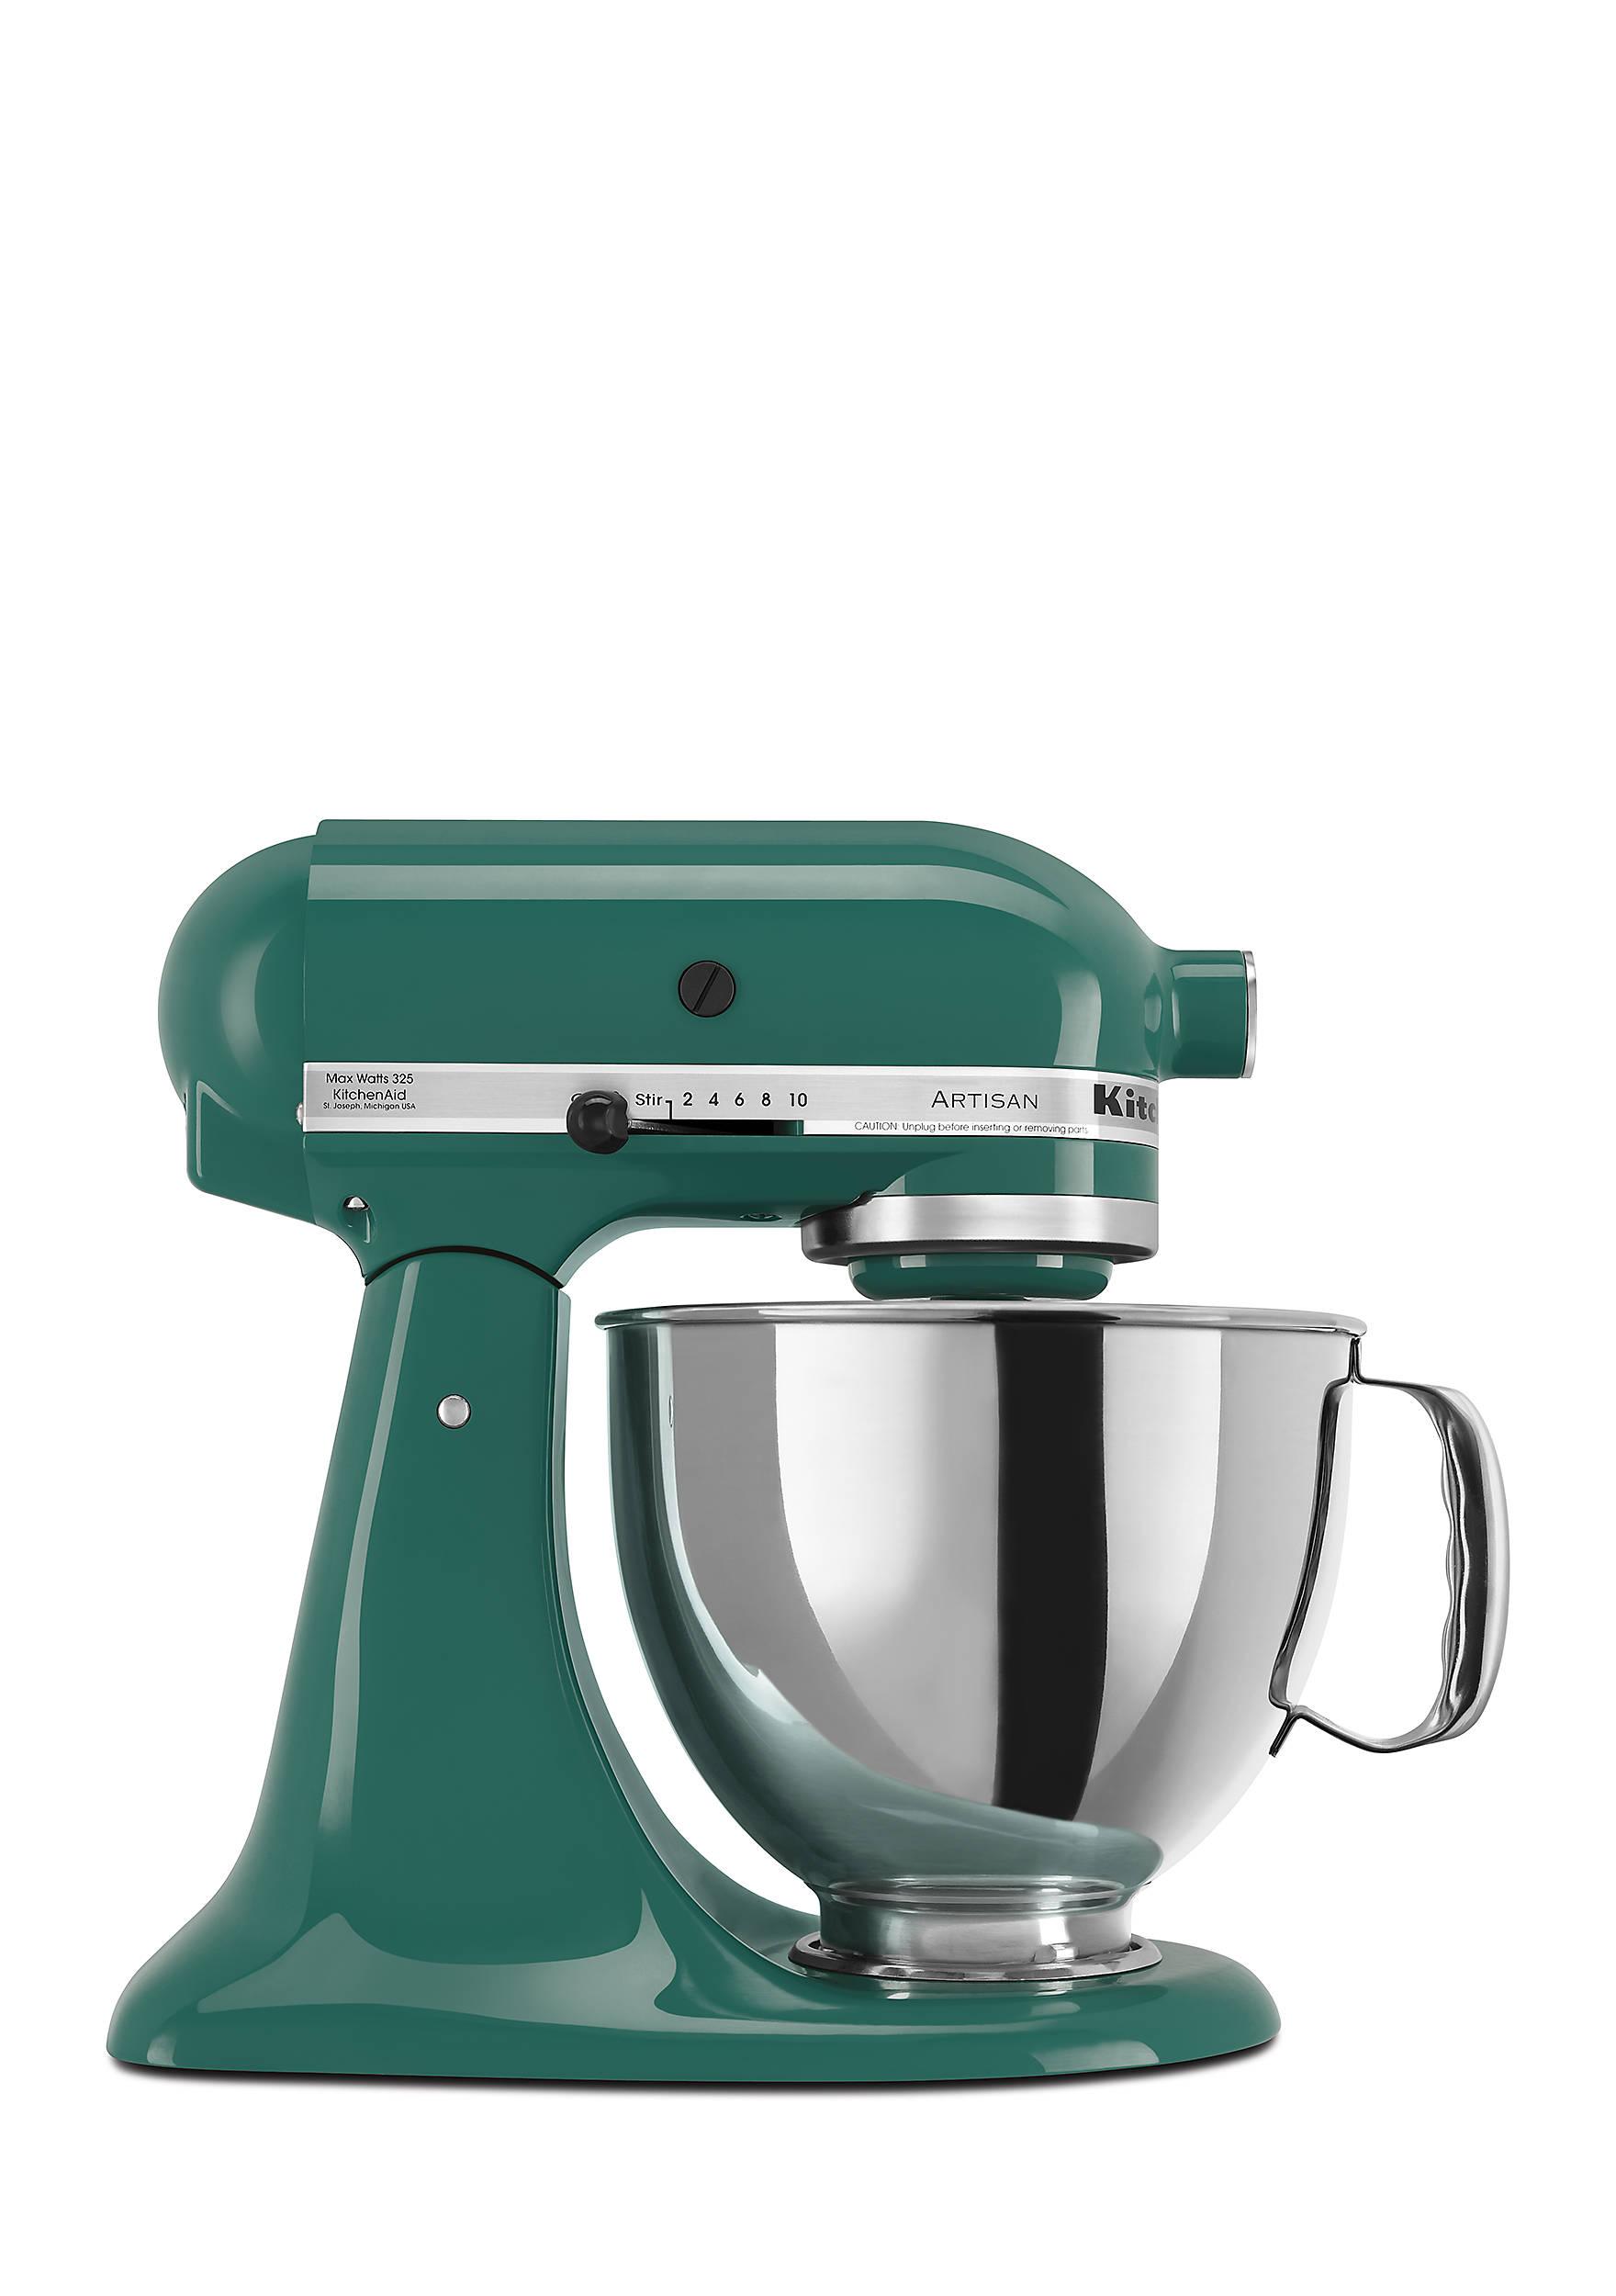 KitchenAid® Artisan Stand 5-qt. Mixer KSM150P | belk